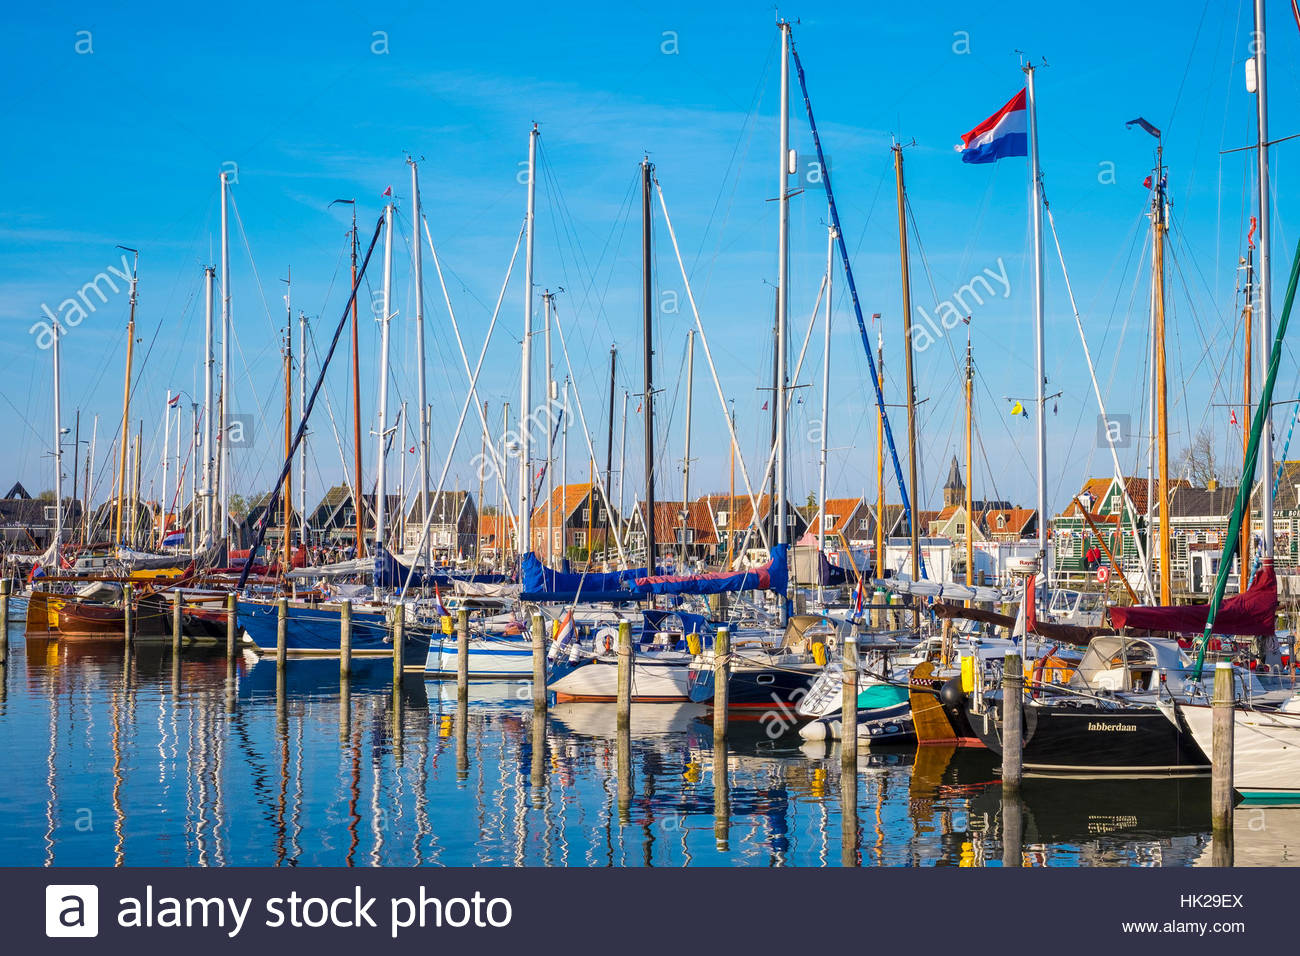 Netherlands, North Holland, Marken. Harbor in Havenbuurt. - Stock Image